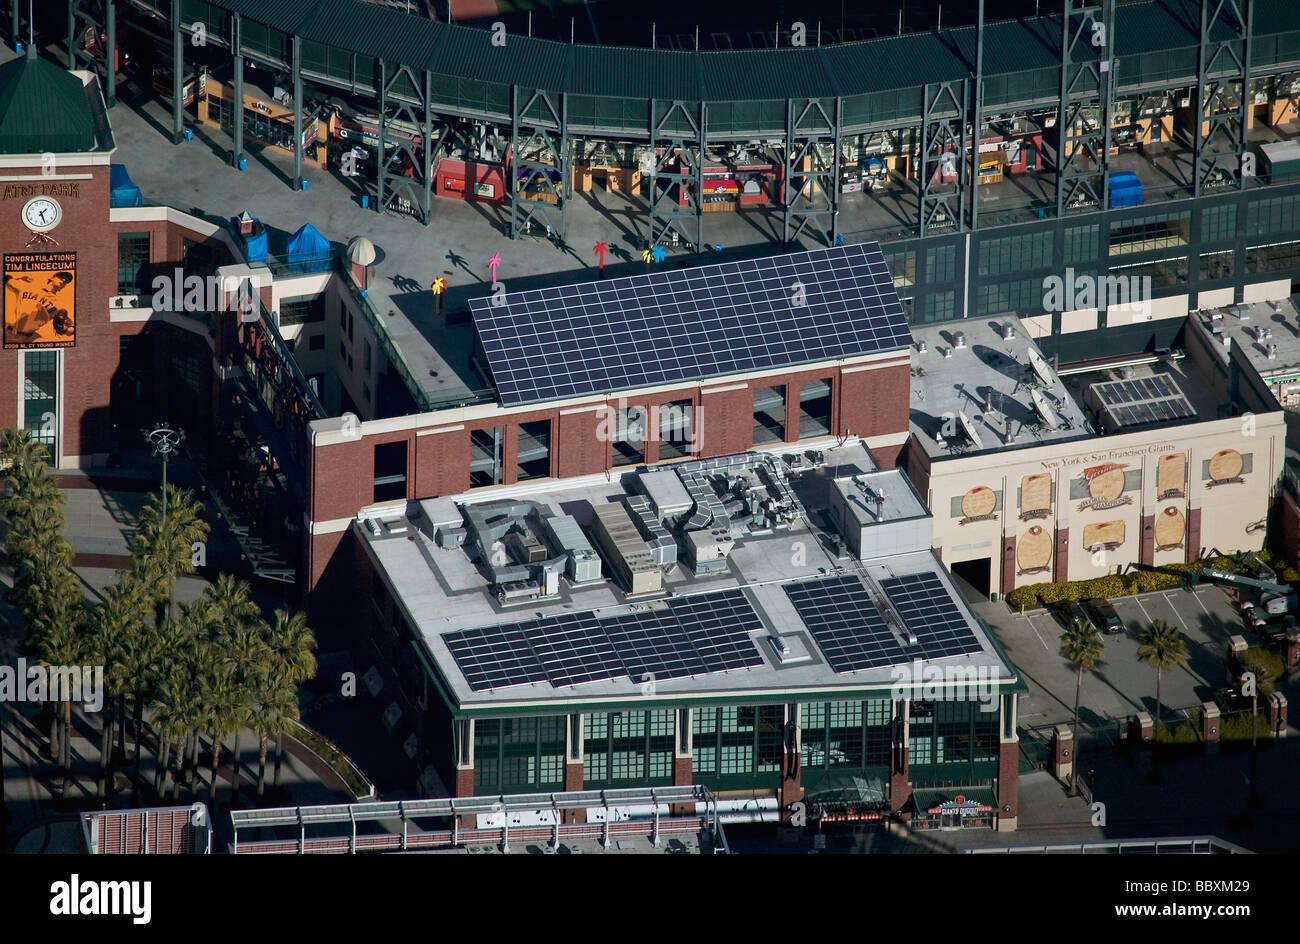 aerial view above solar panels at AT&T Giants baseball stadium San Francisco California Stock Photo